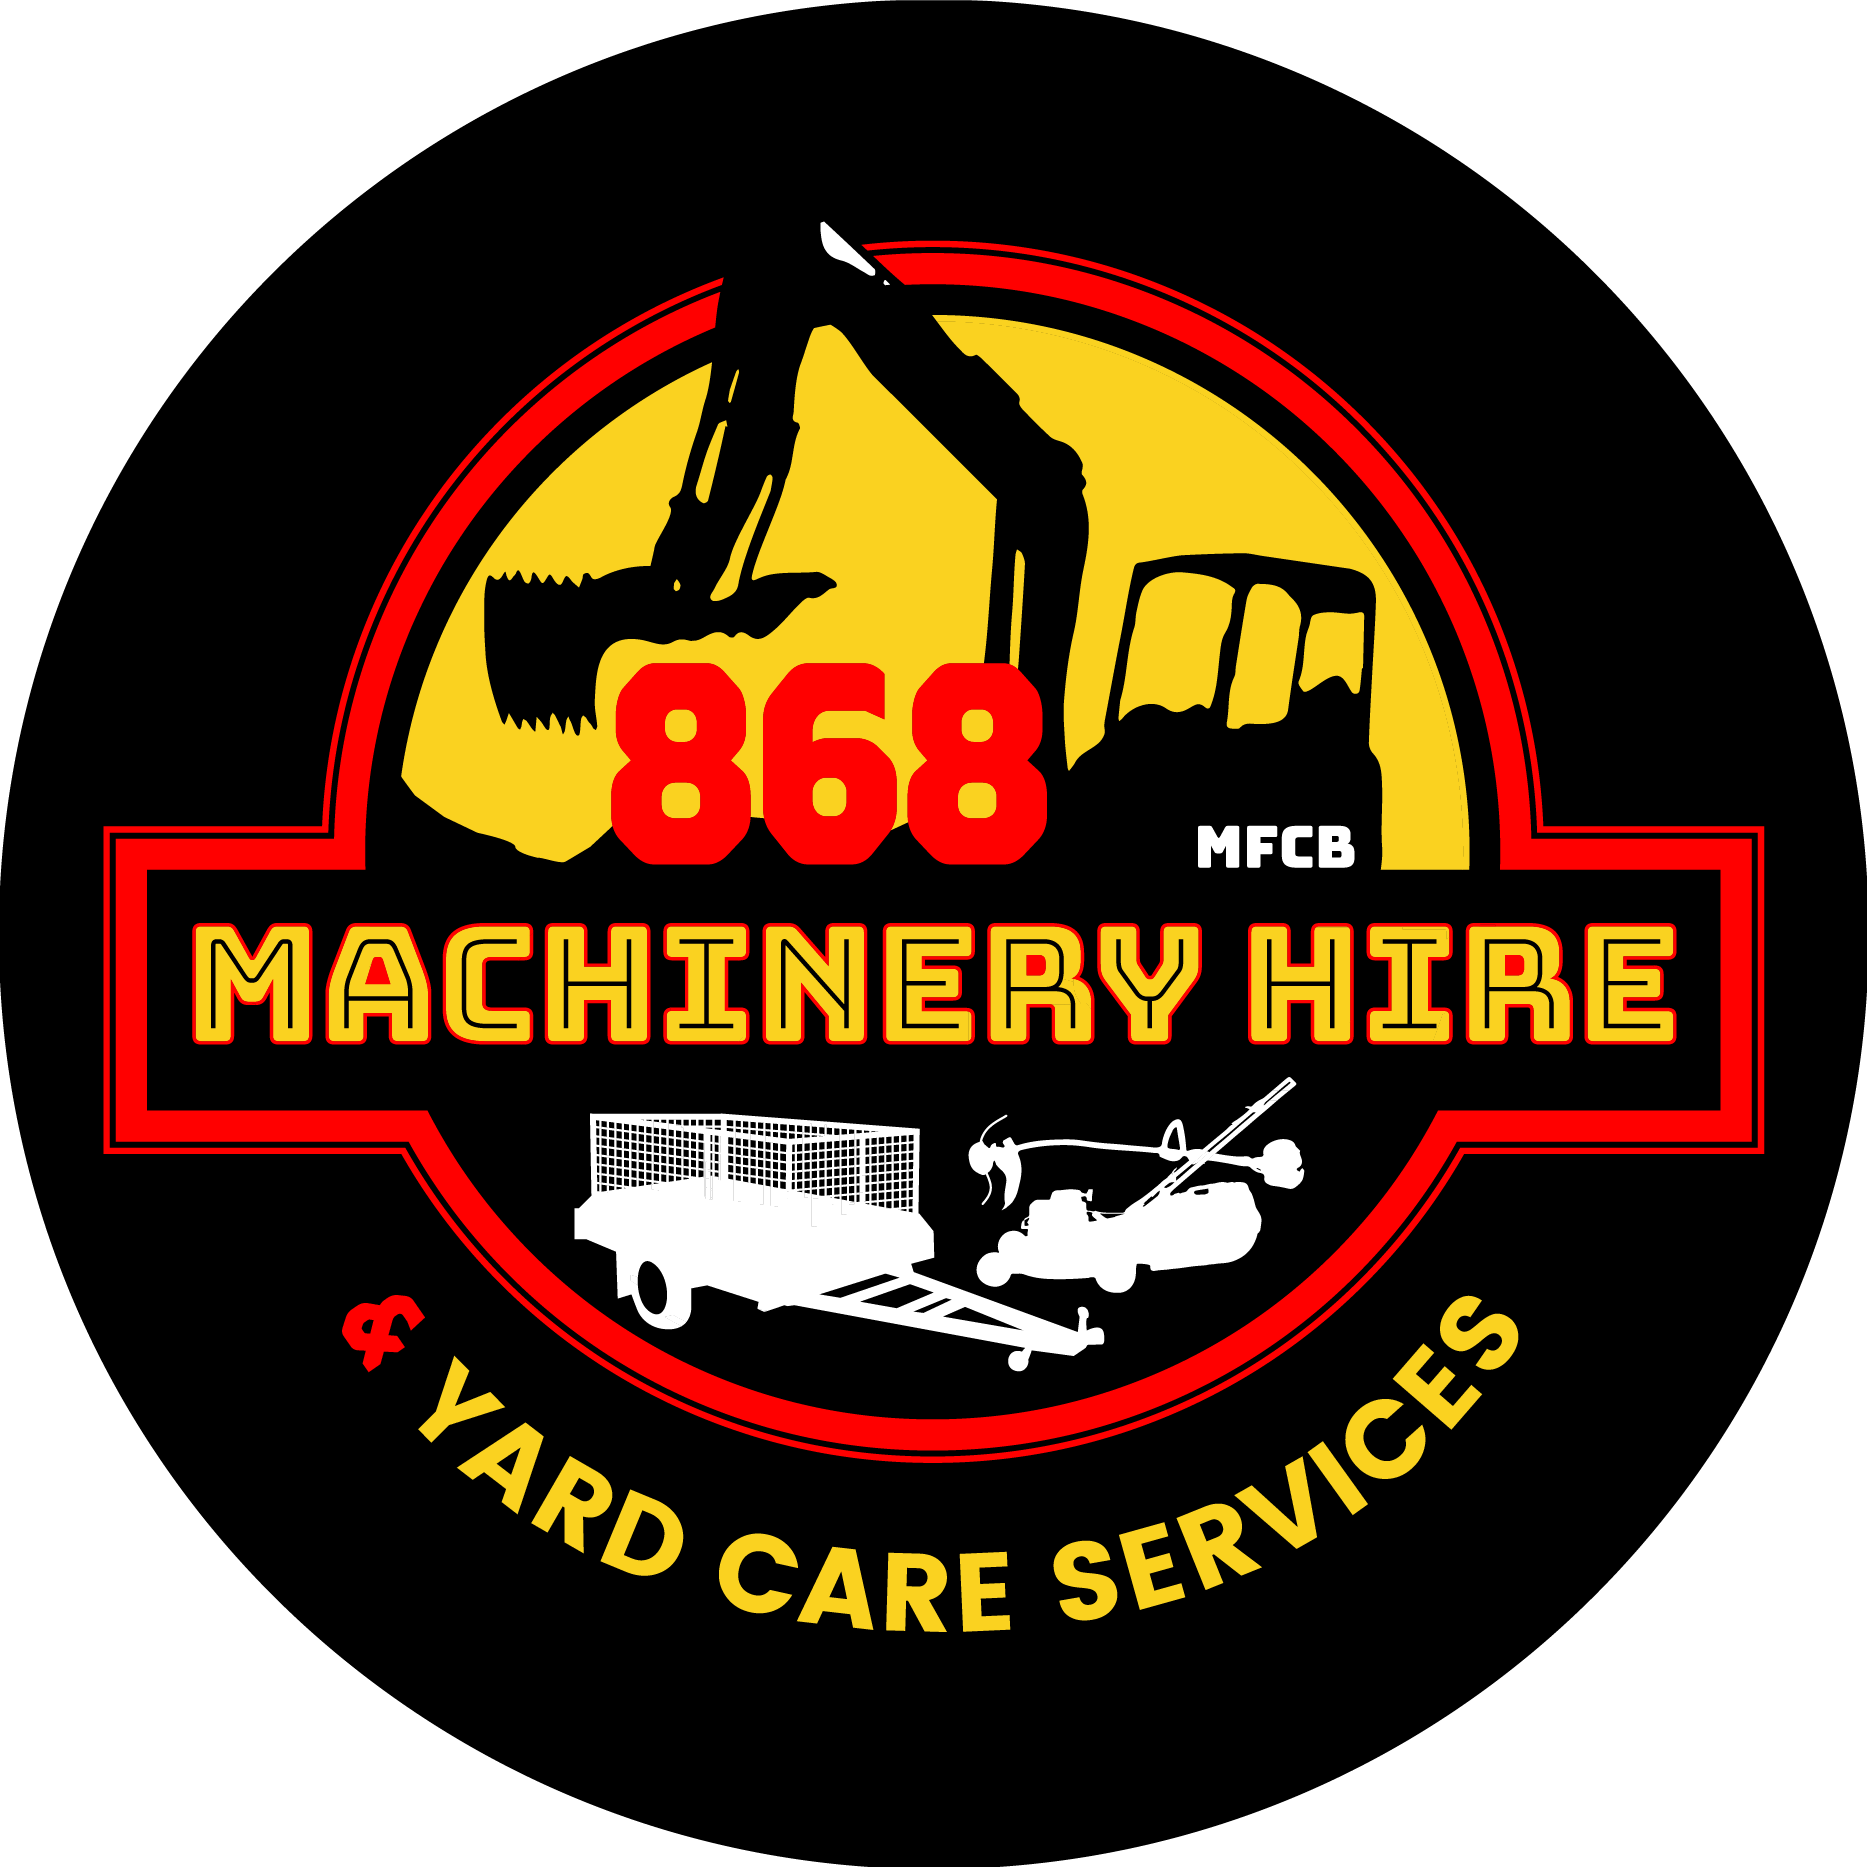 868 Machinery Hire